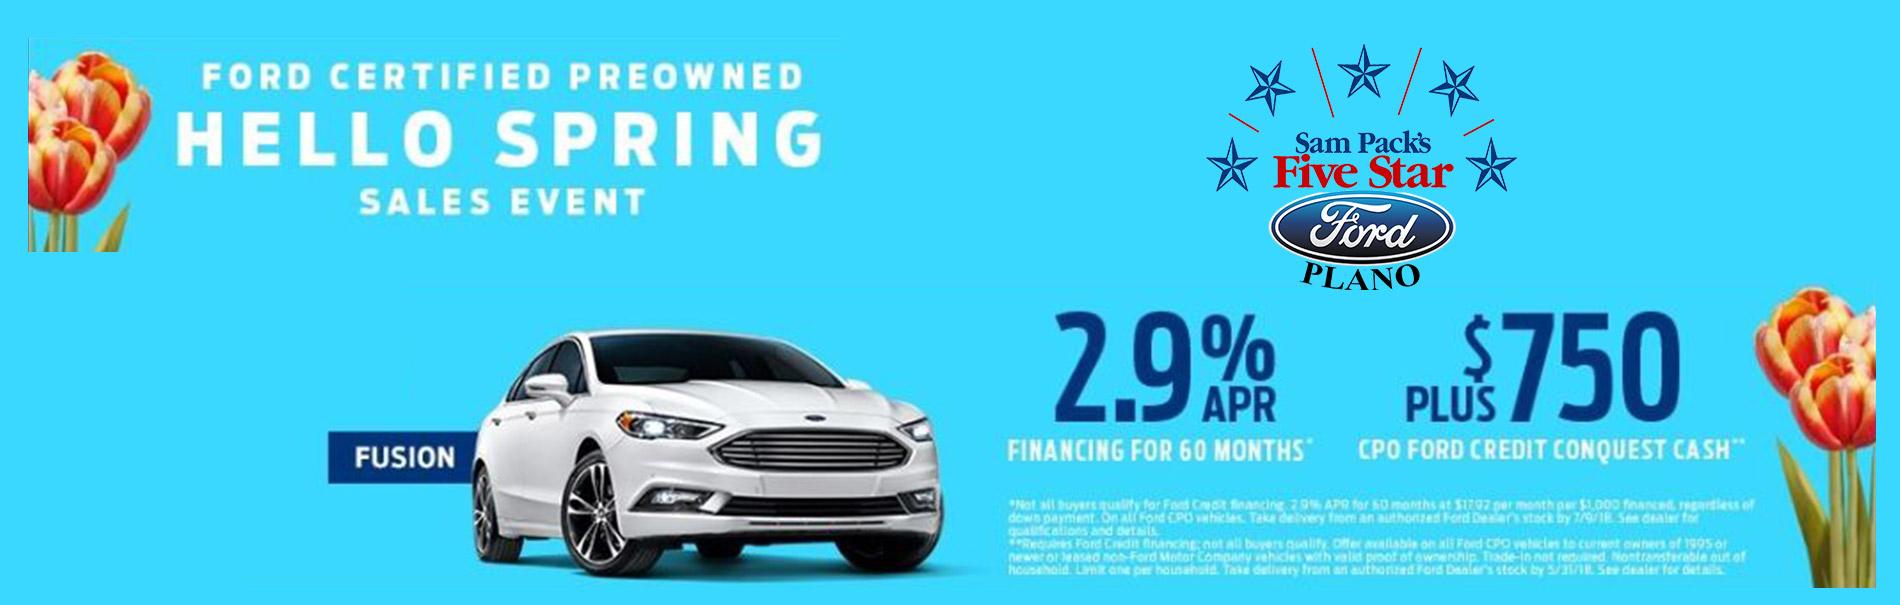 Ford Dealership Dallas Tx 2018 2019 2020 Ford Cars